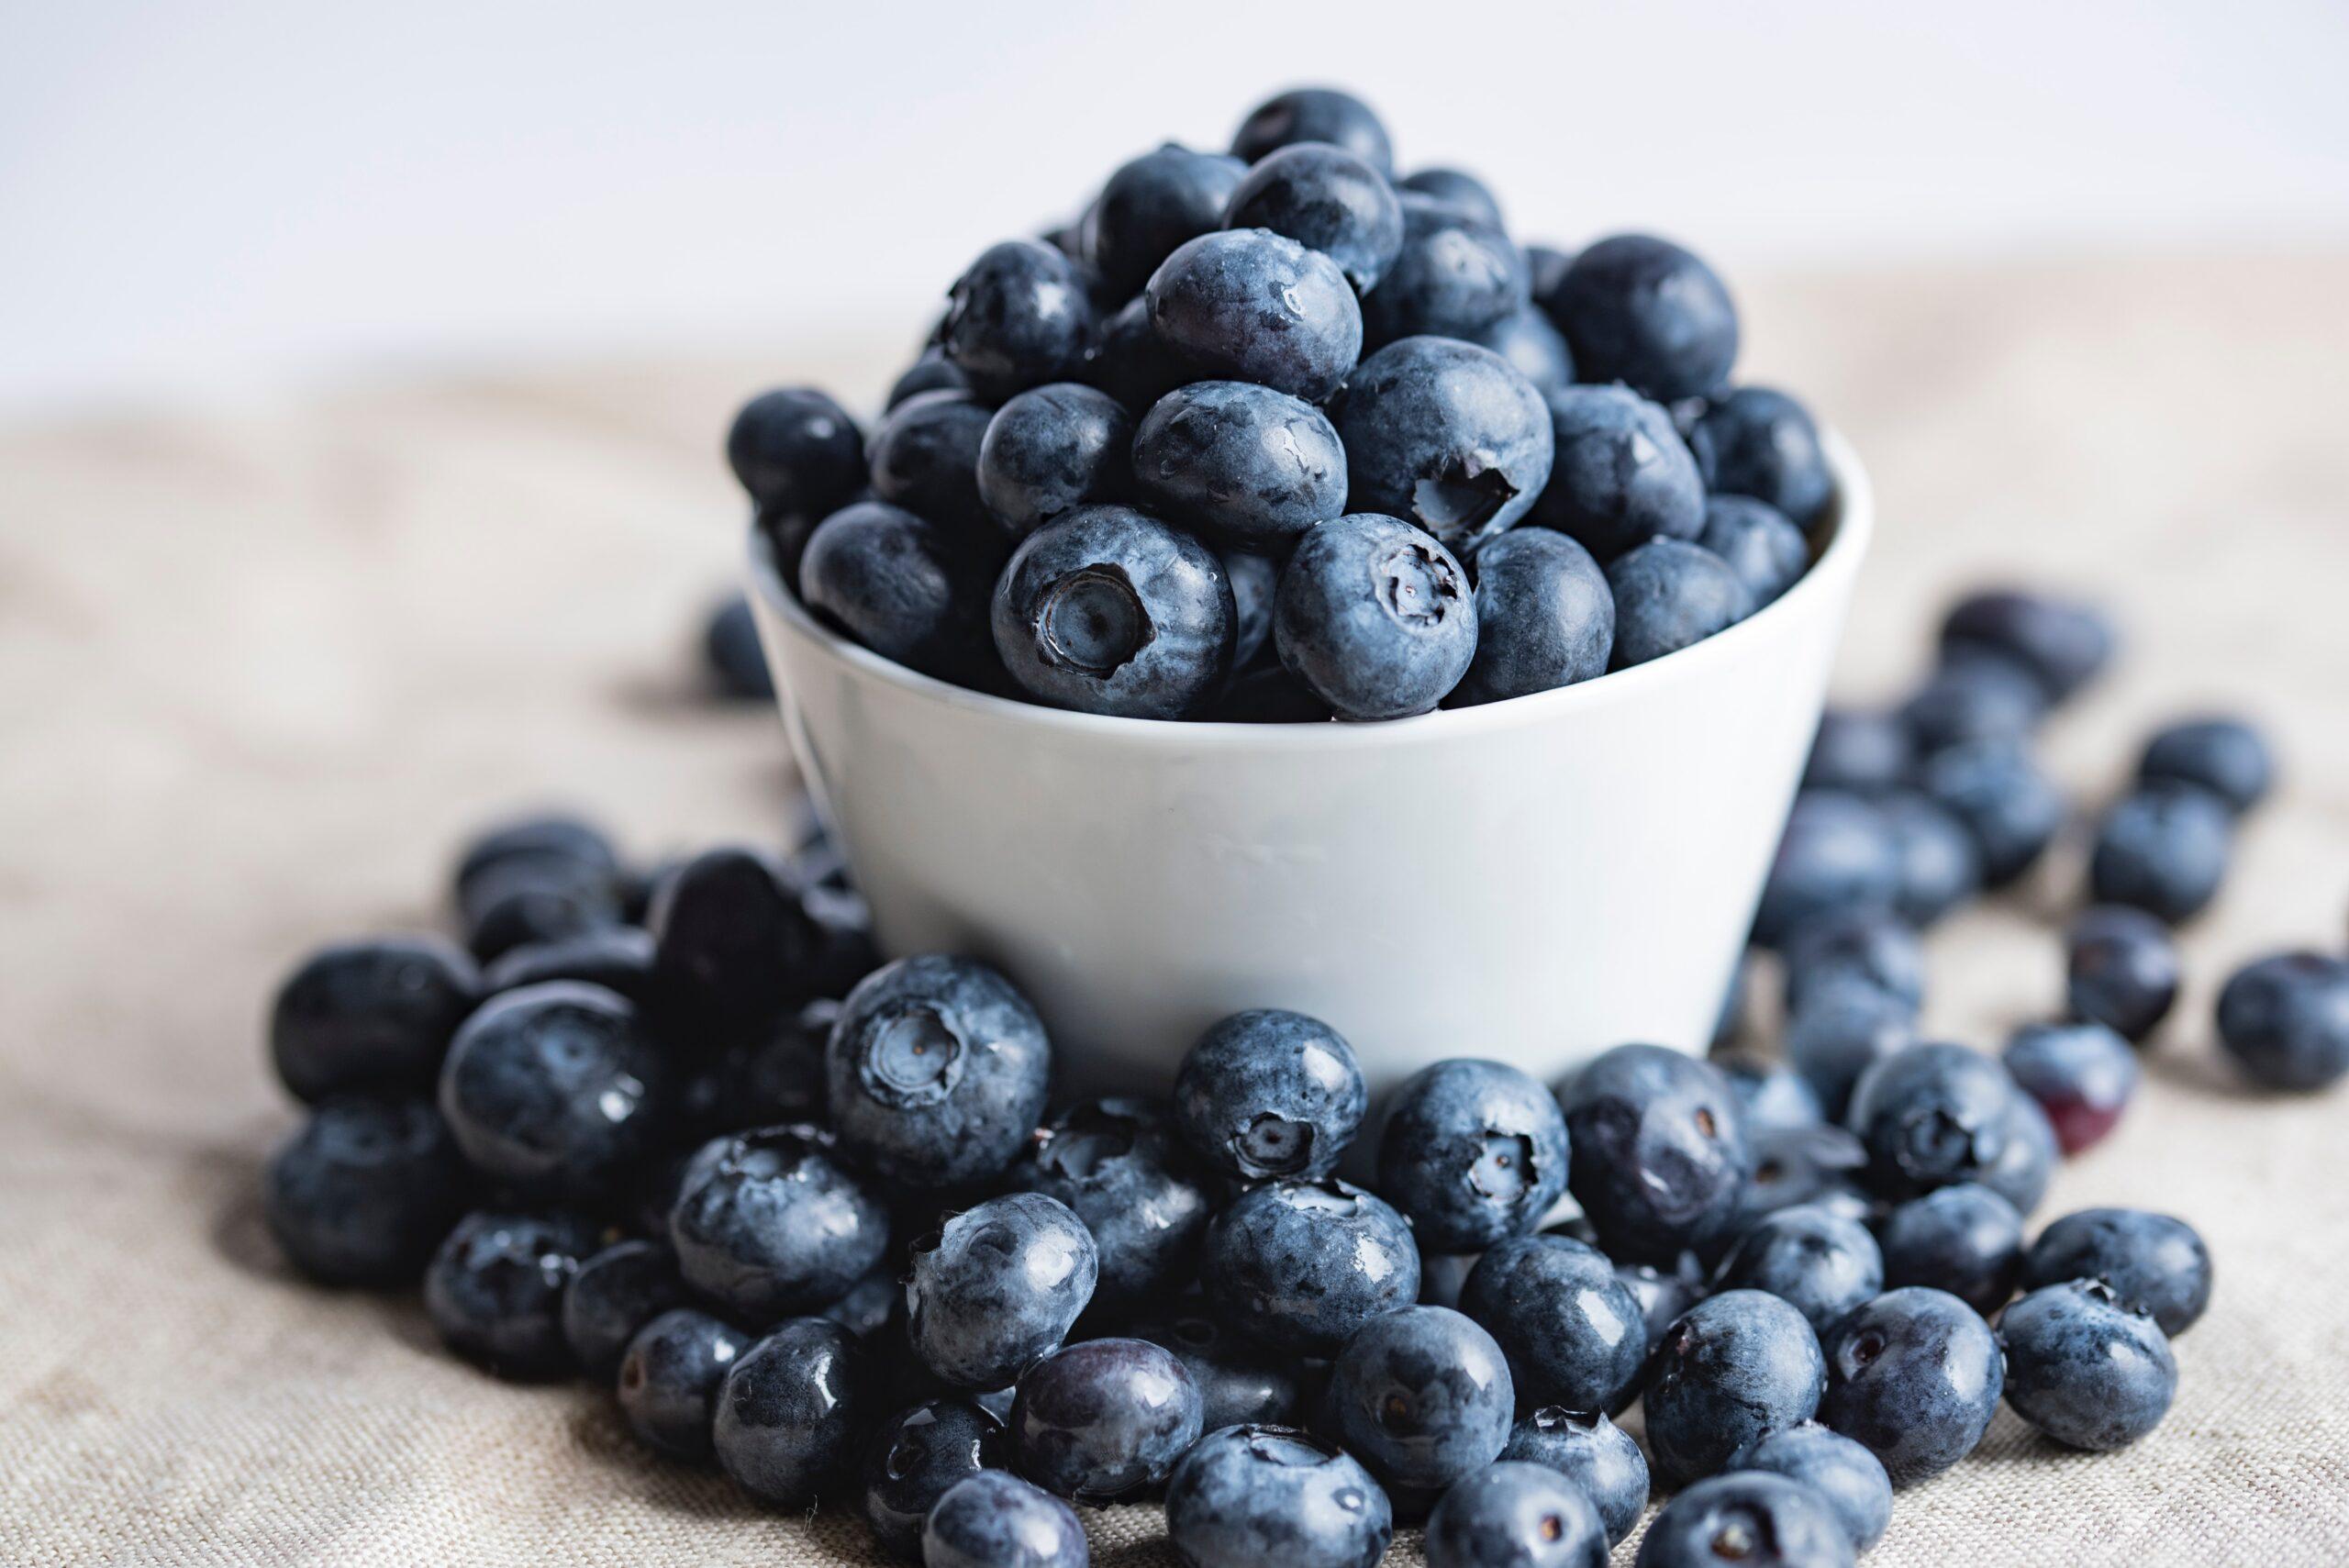 Blueberries are amazing vine fruit